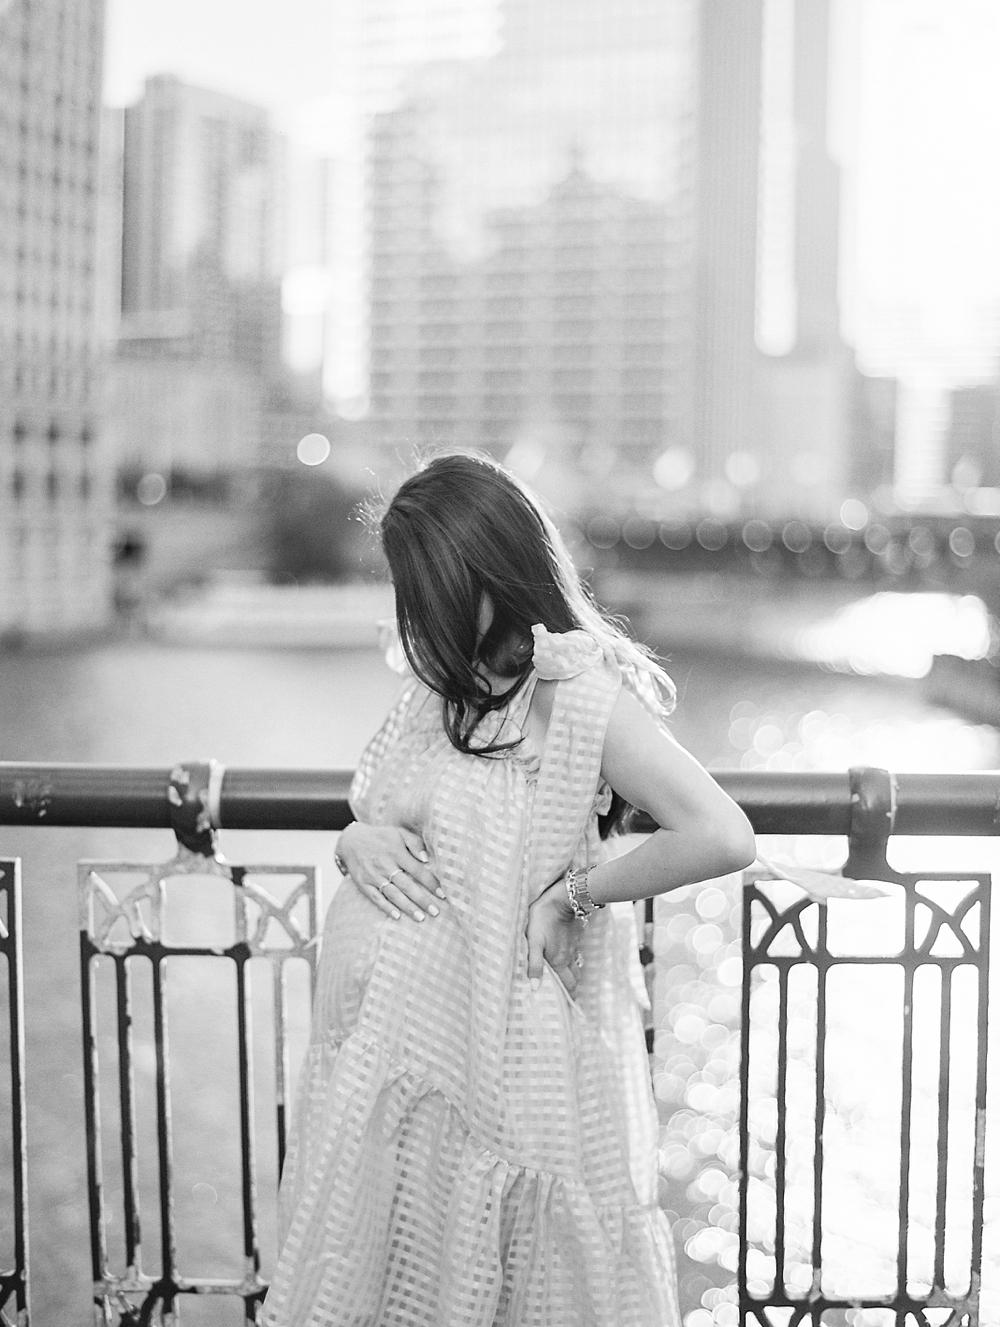 Kristin-La-Voie-Photography-Chicago-Maternity-Fine-Art-Film-Top-Photographer-62